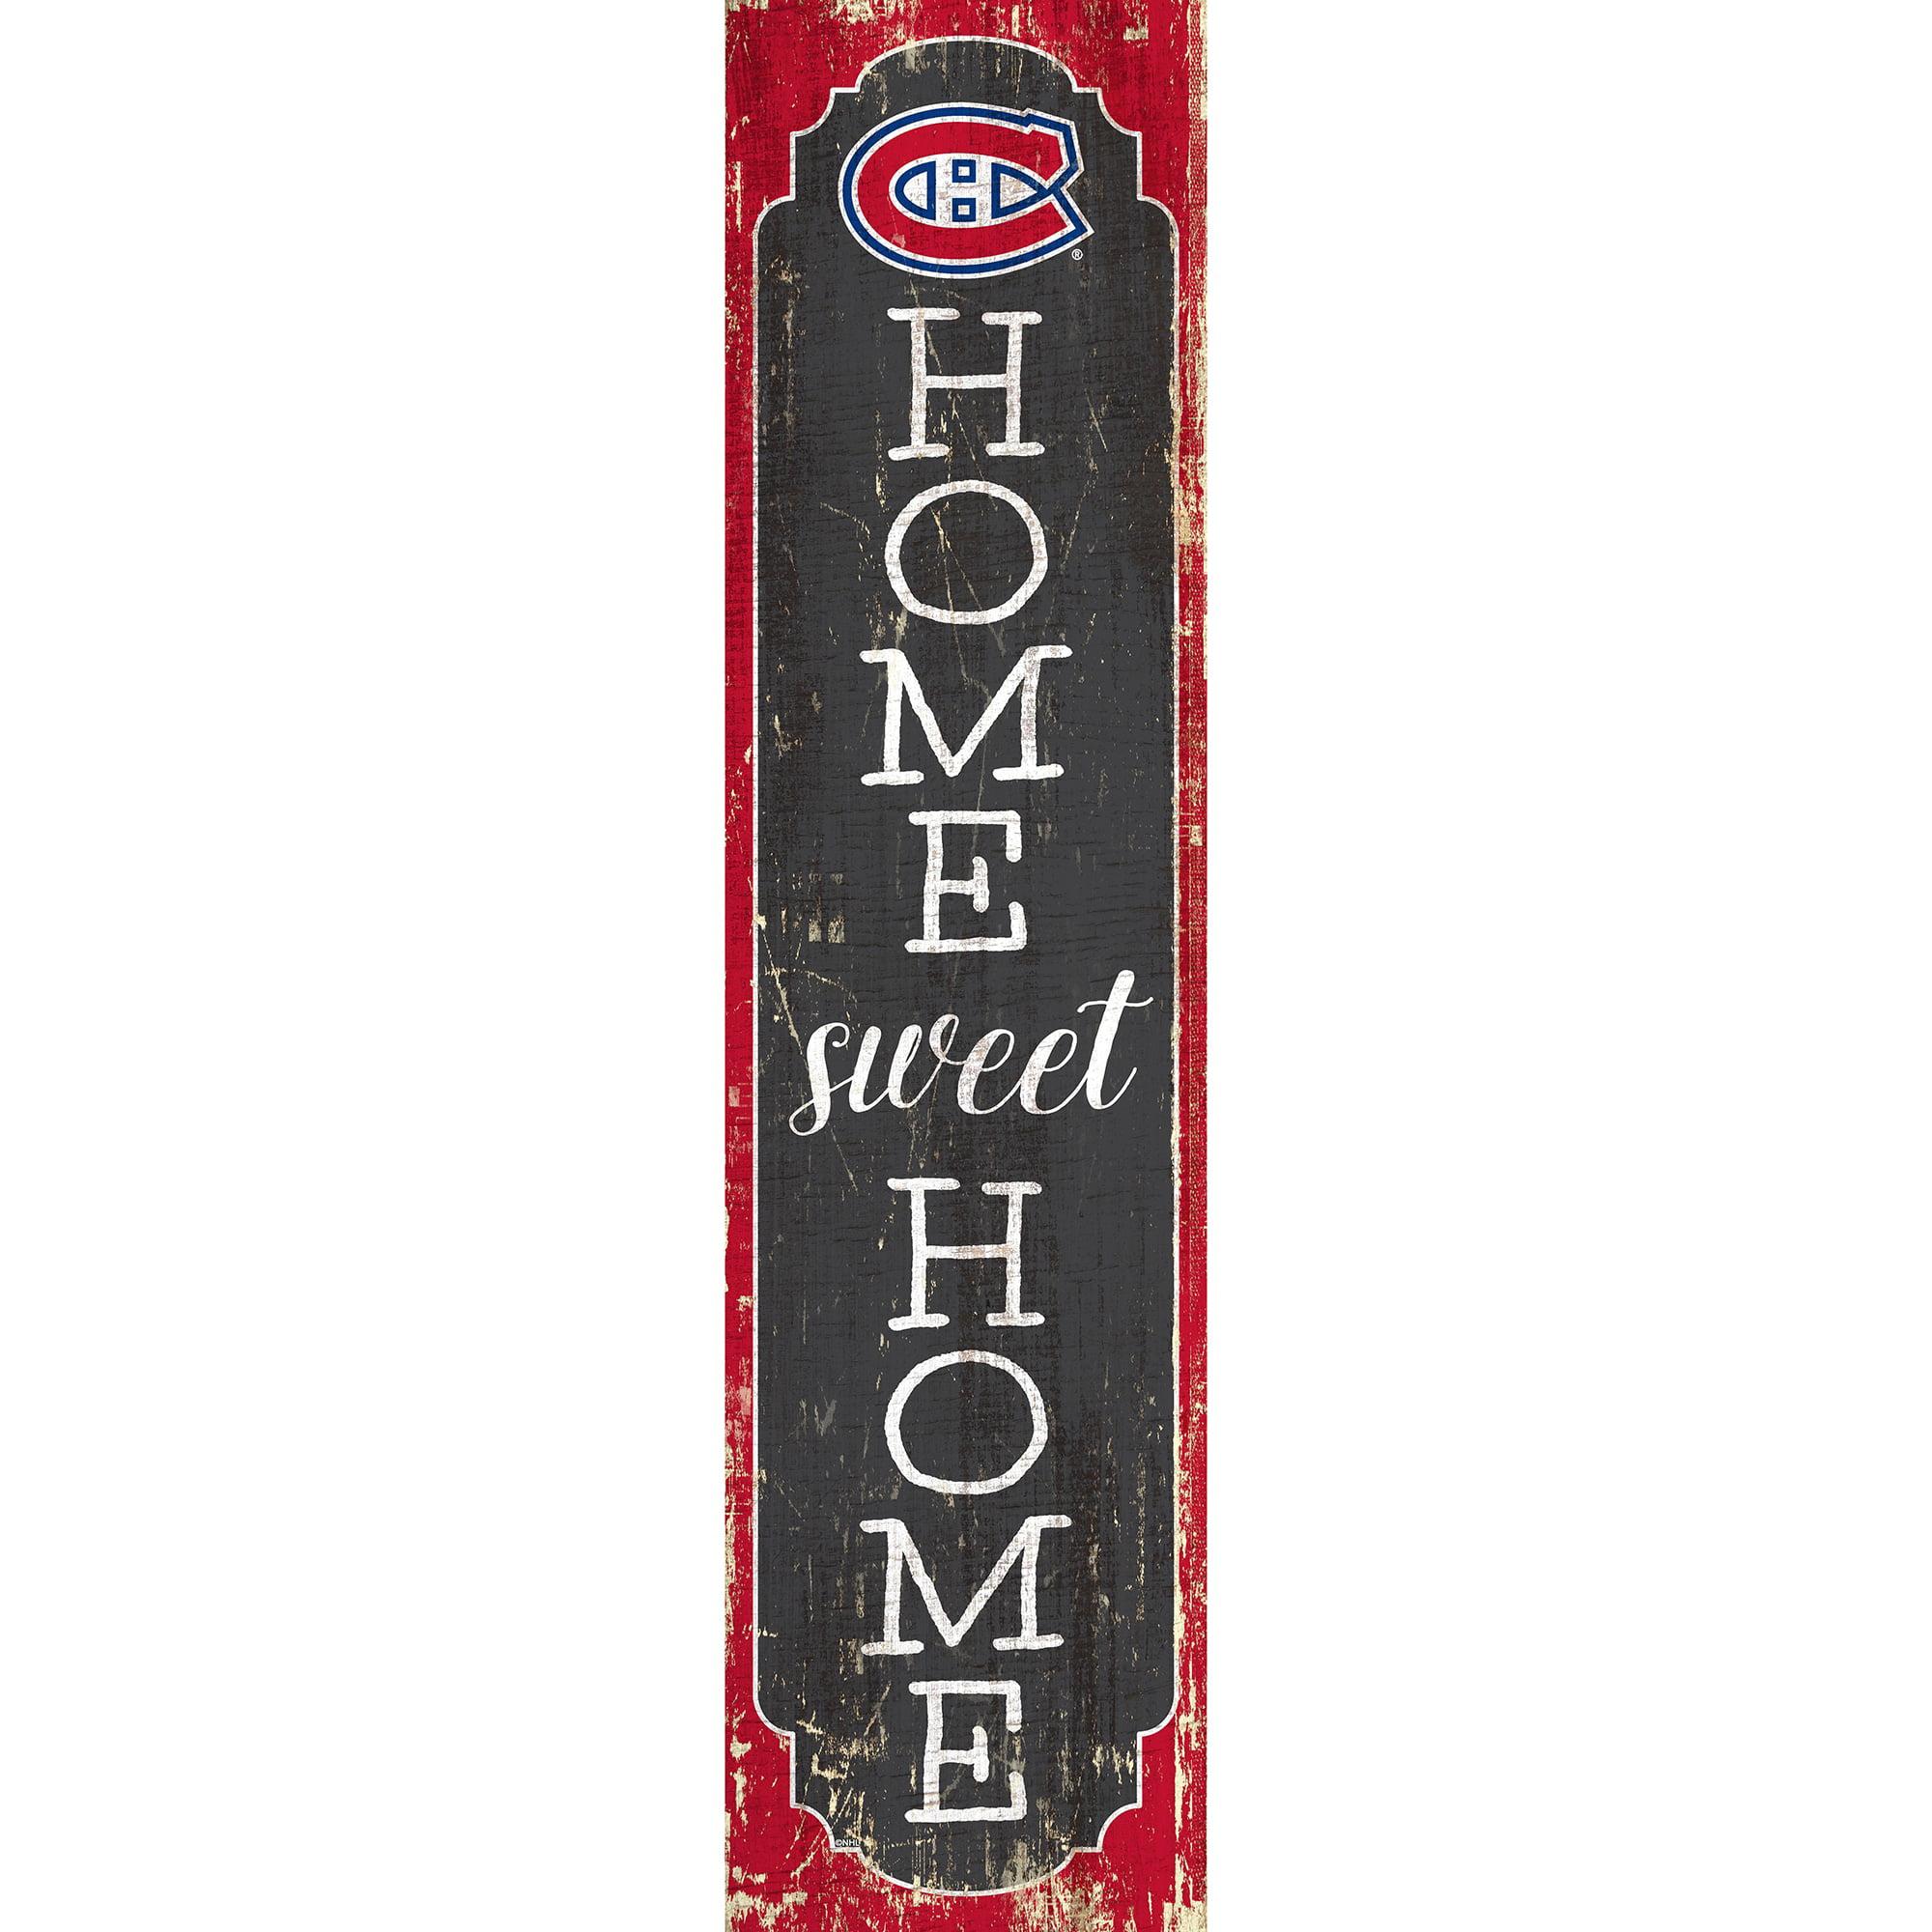 Montreal Canadiens 24 Home Sweet Home Leaner Sign Walmart Com Walmart Com